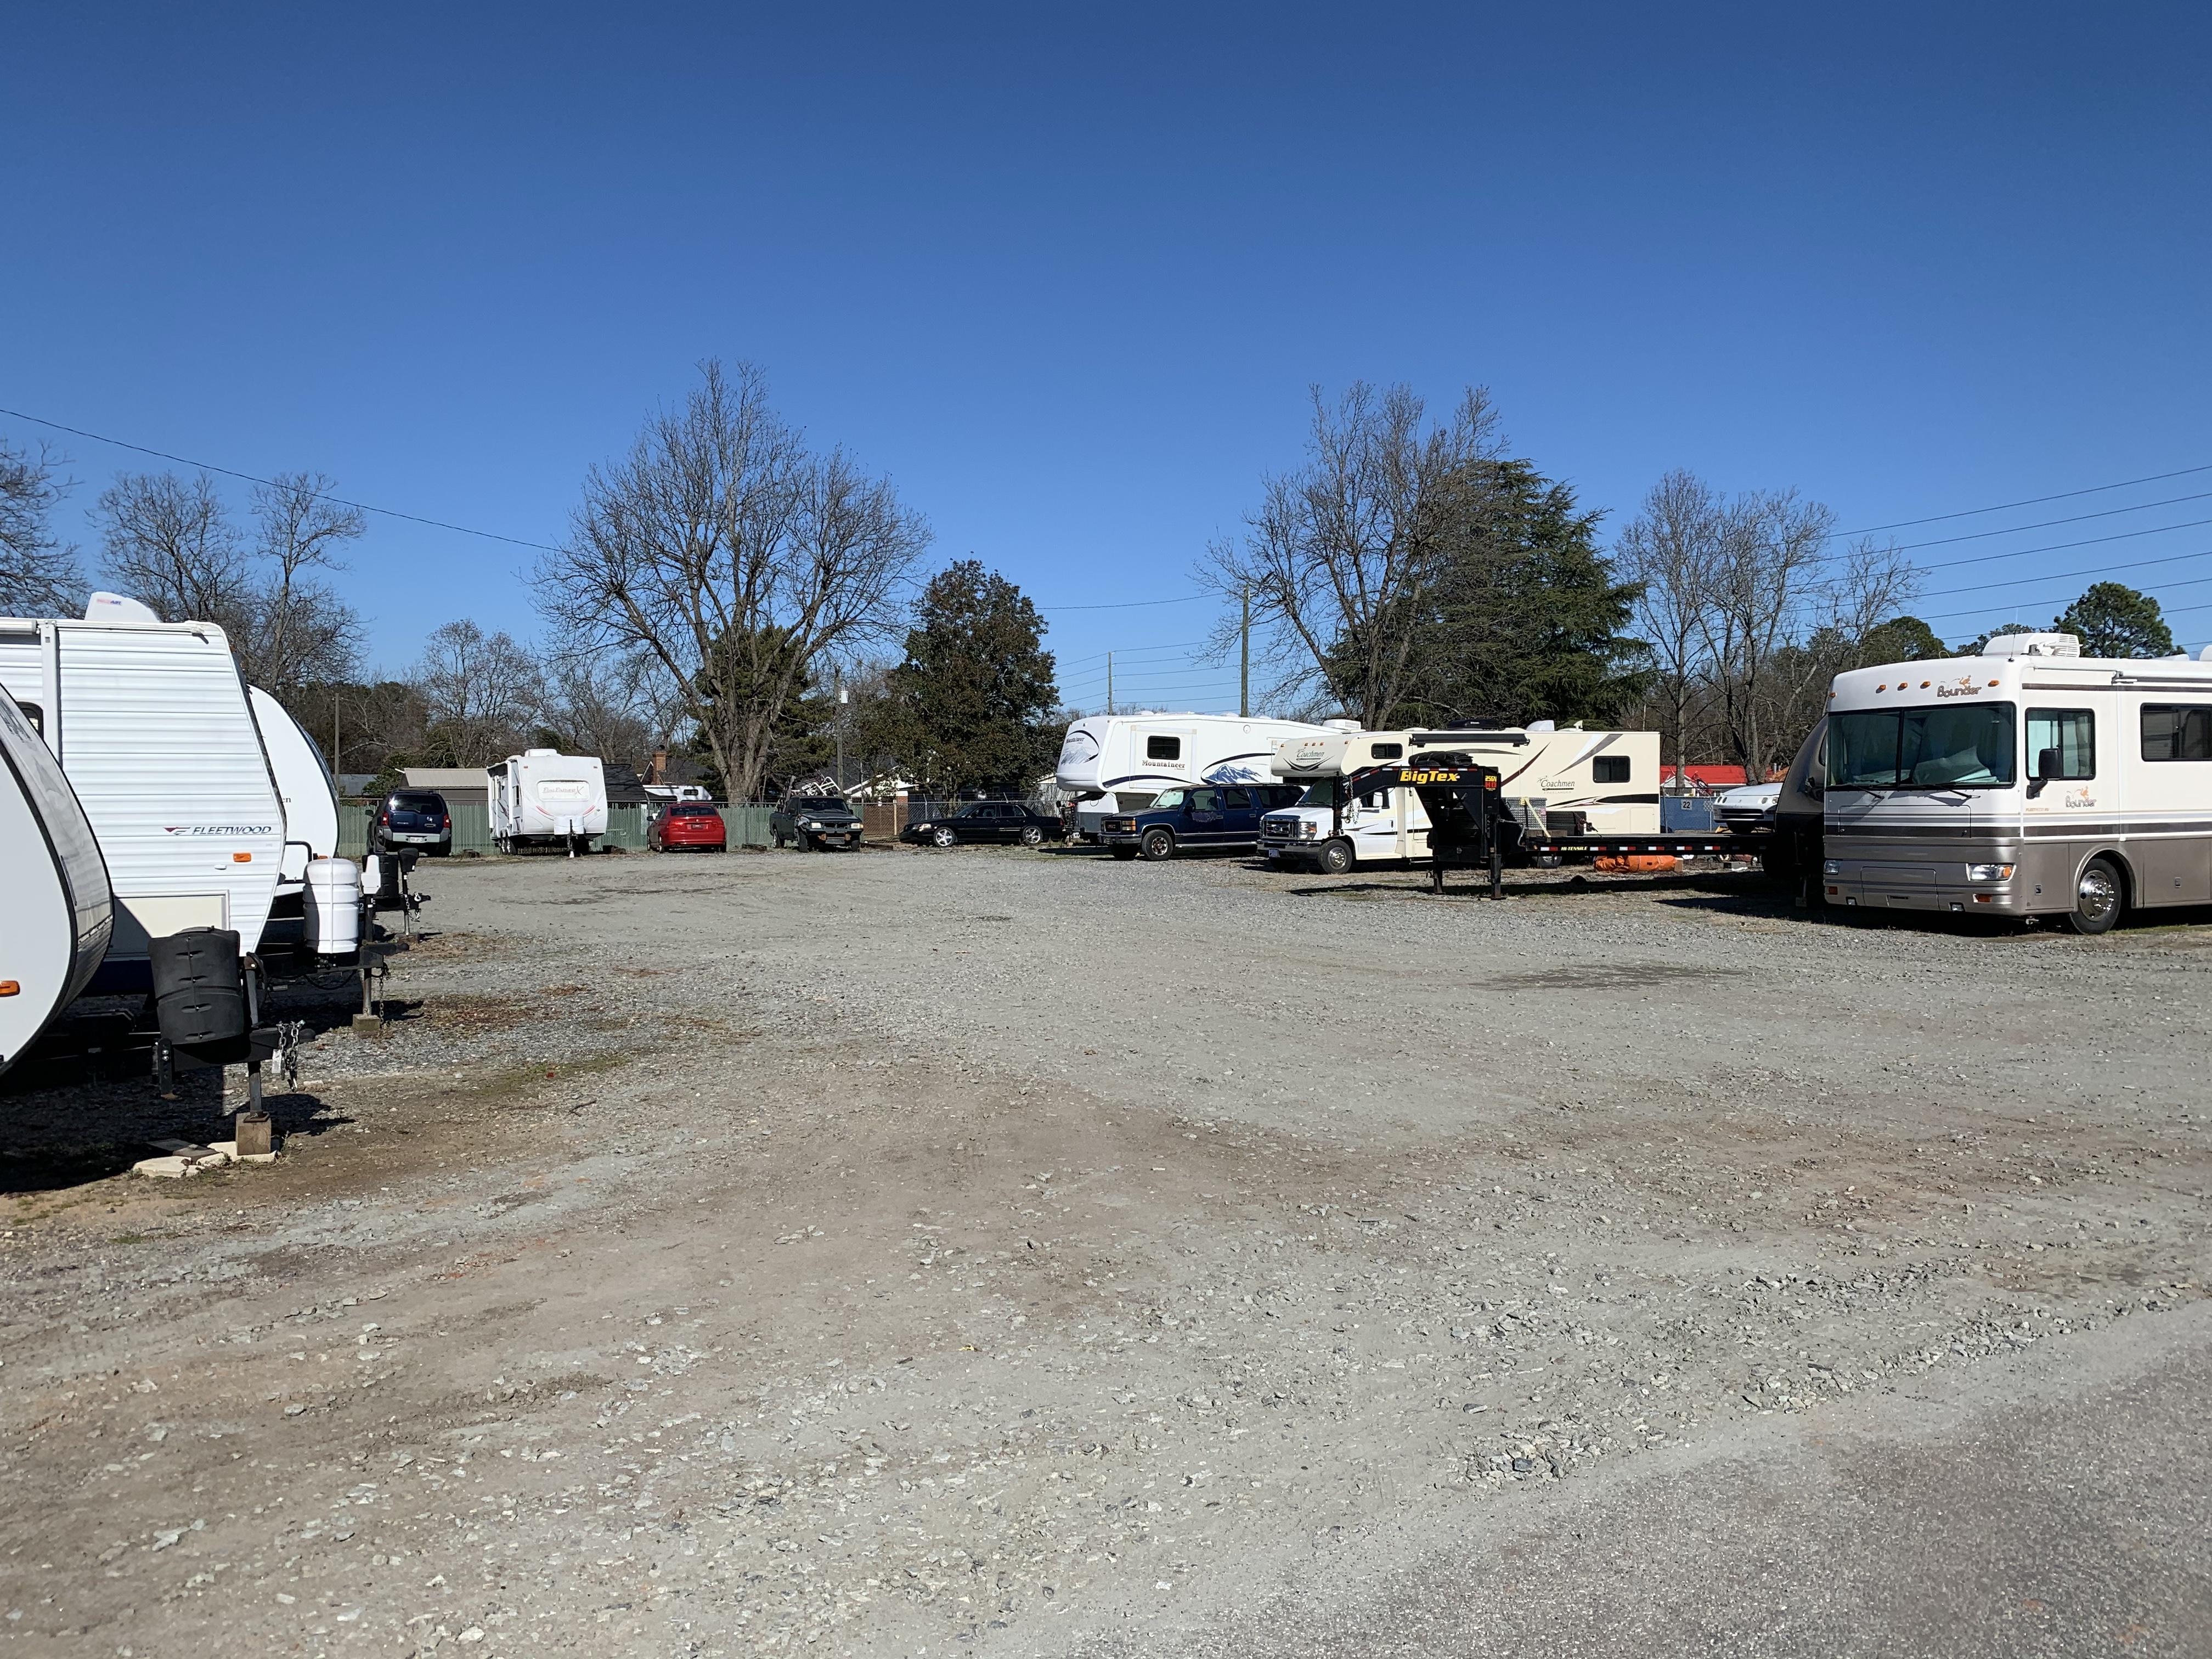 Parking spots in Centerville, GA